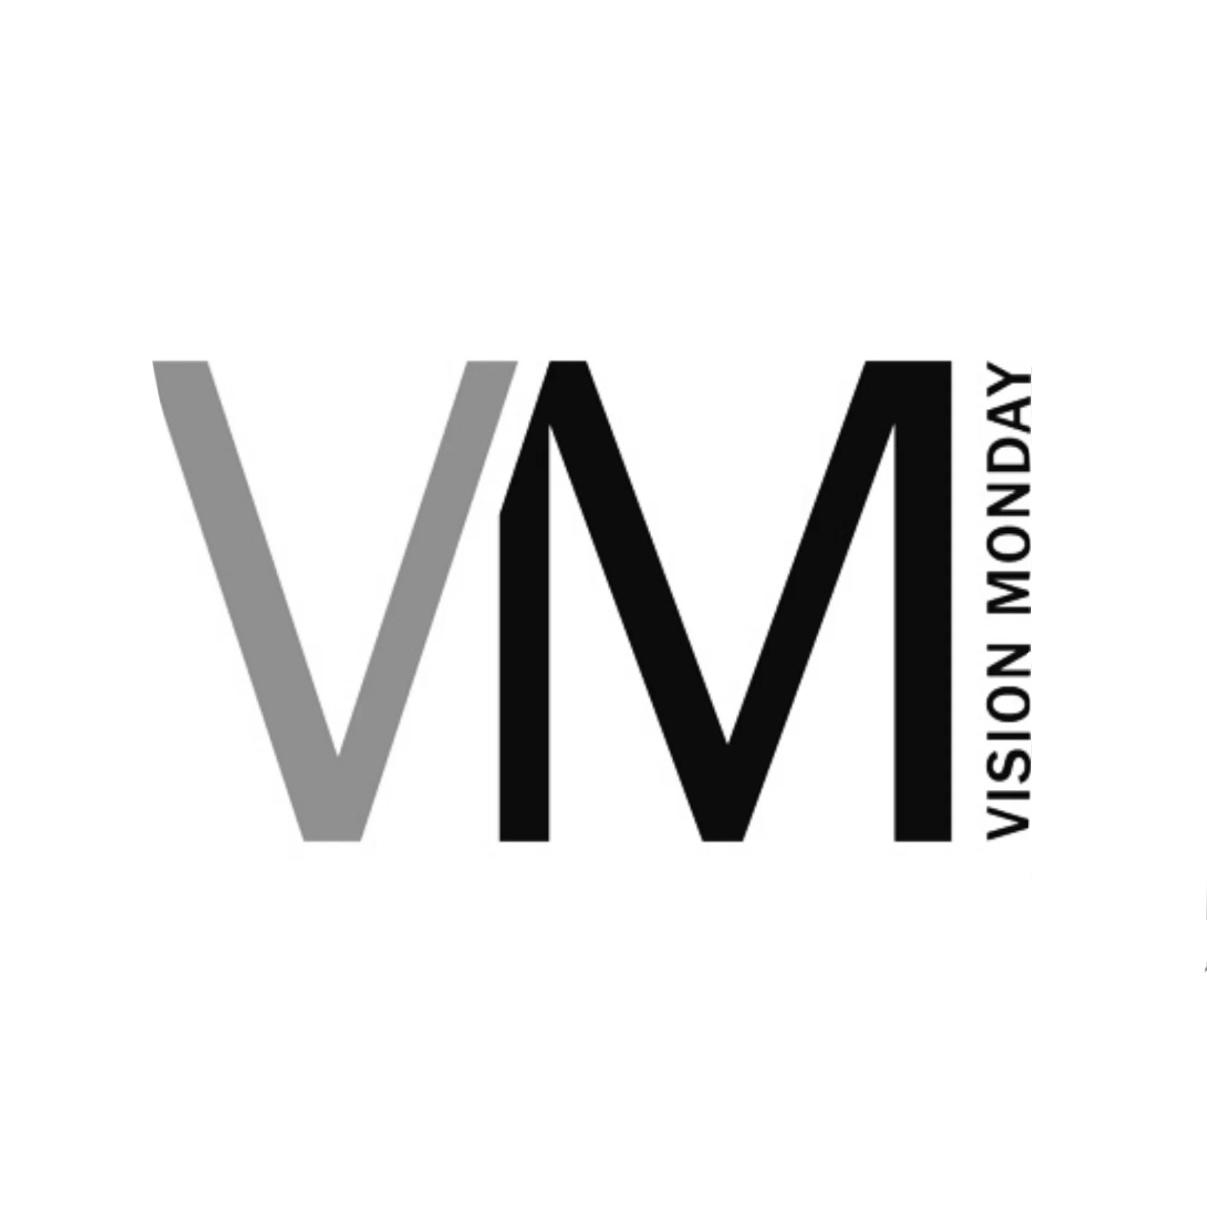 vision monday logo